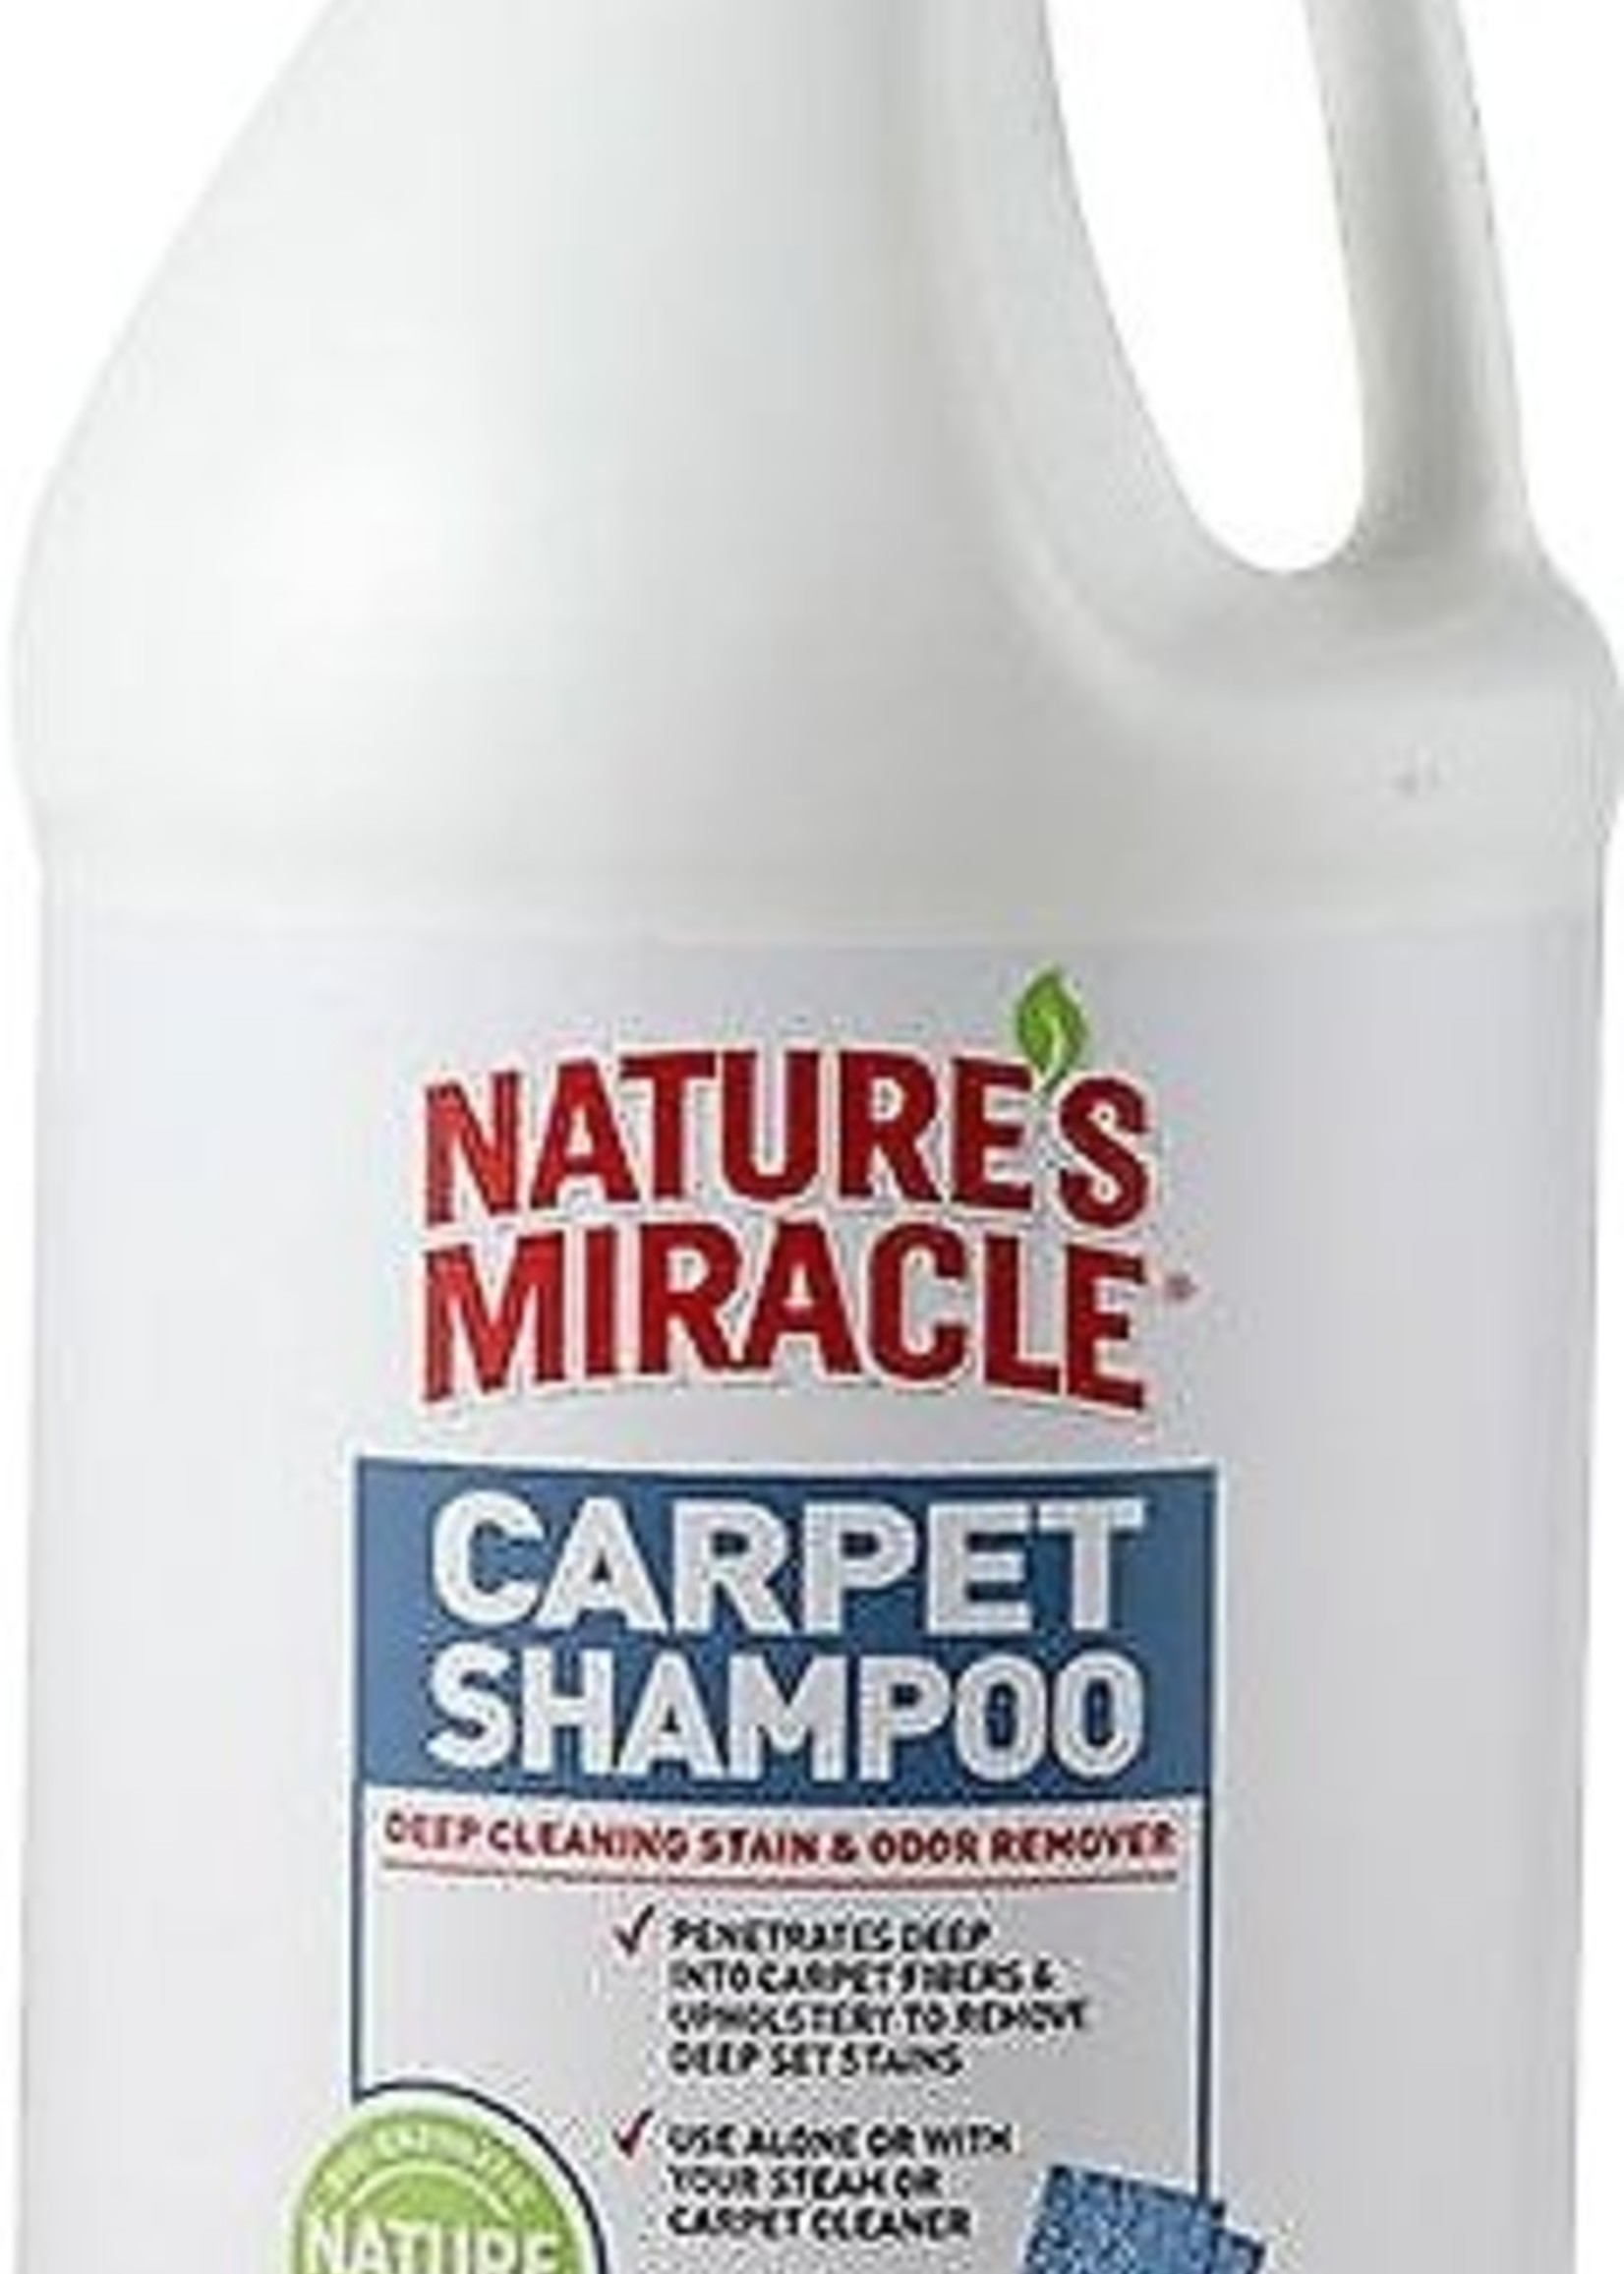 Nature's Miracle Nature's Miracle Carpet Shampoo 64 oz